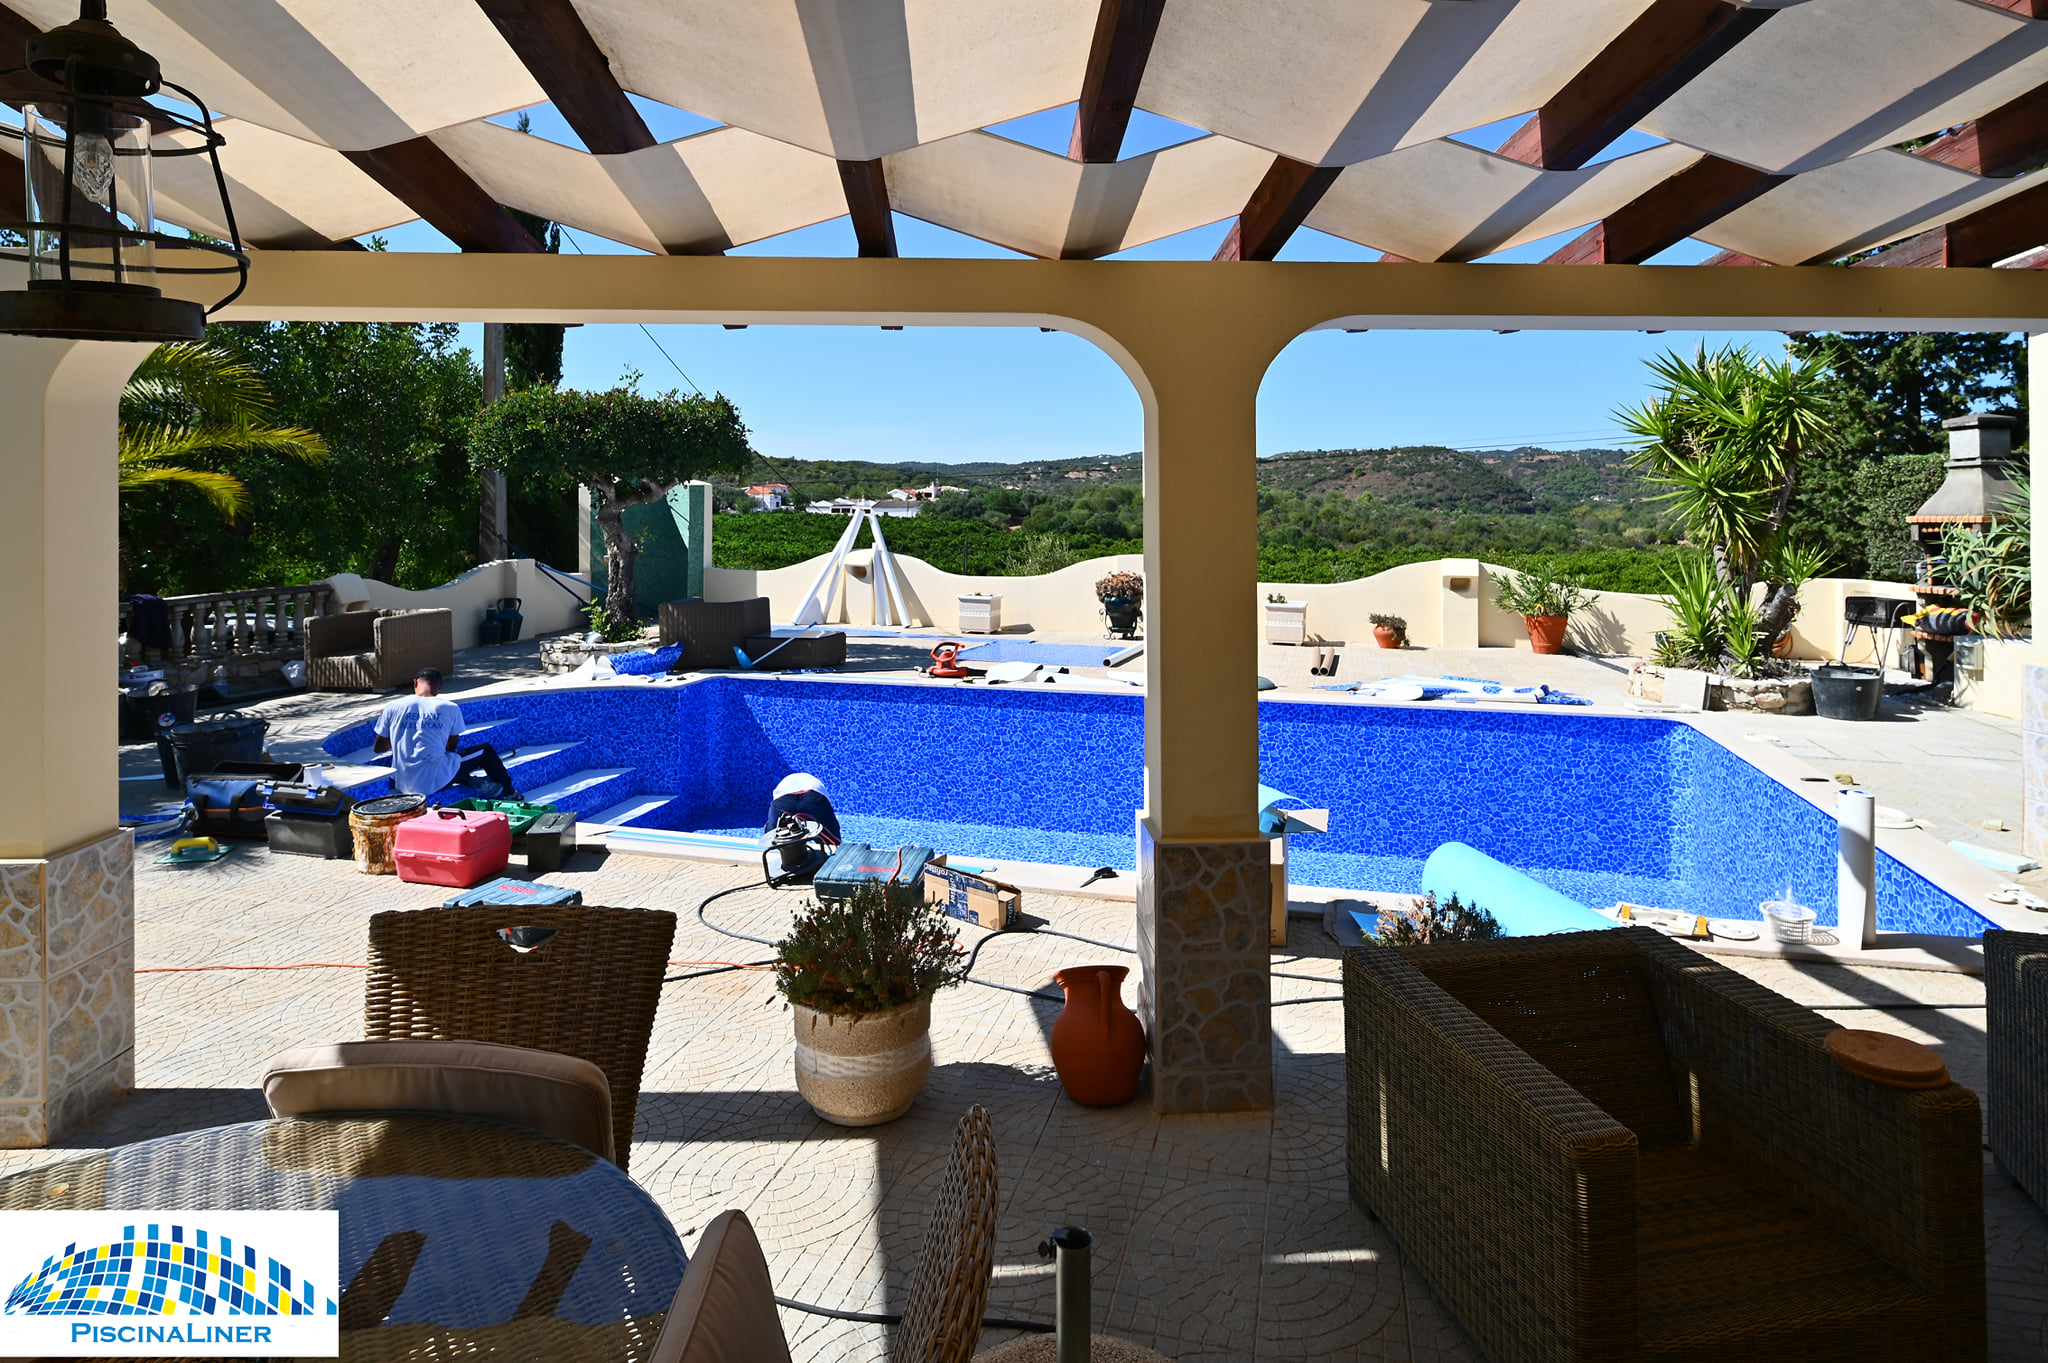 Renovating a liner swimming pool